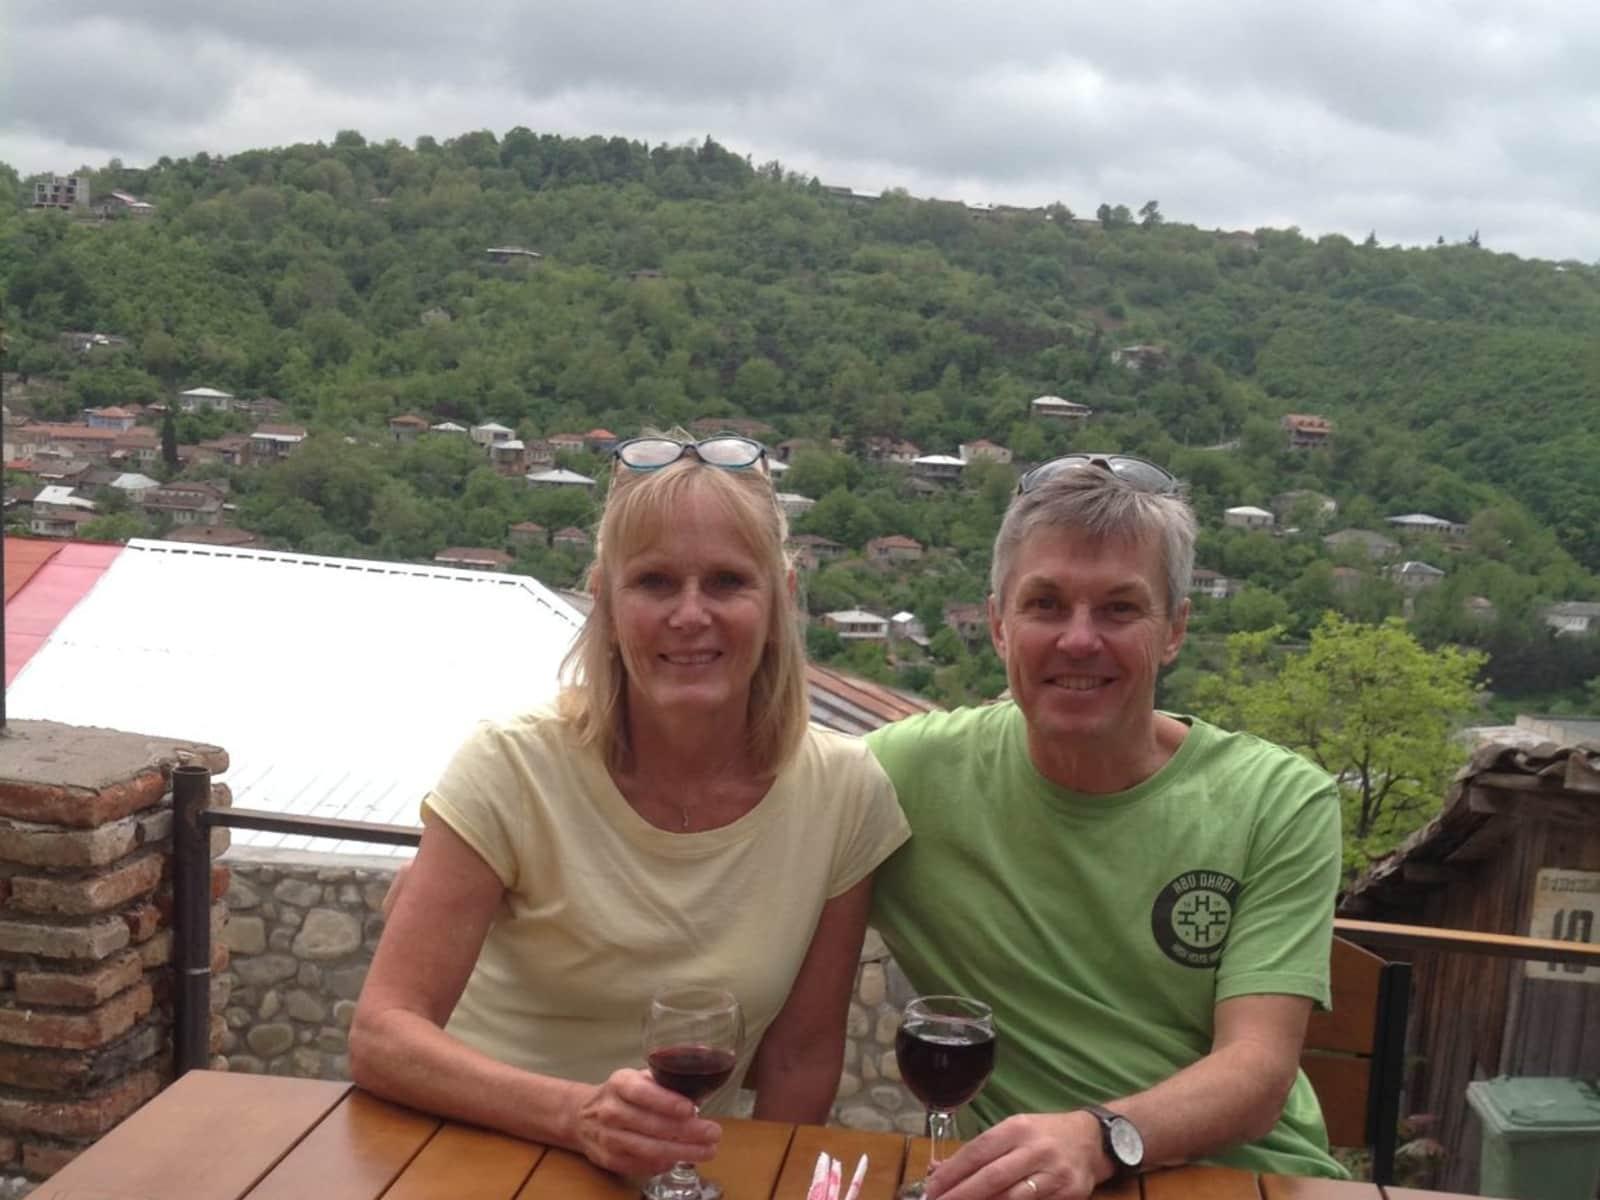 Rob & Karen from Saskatoon, Saskatchewan, Canada